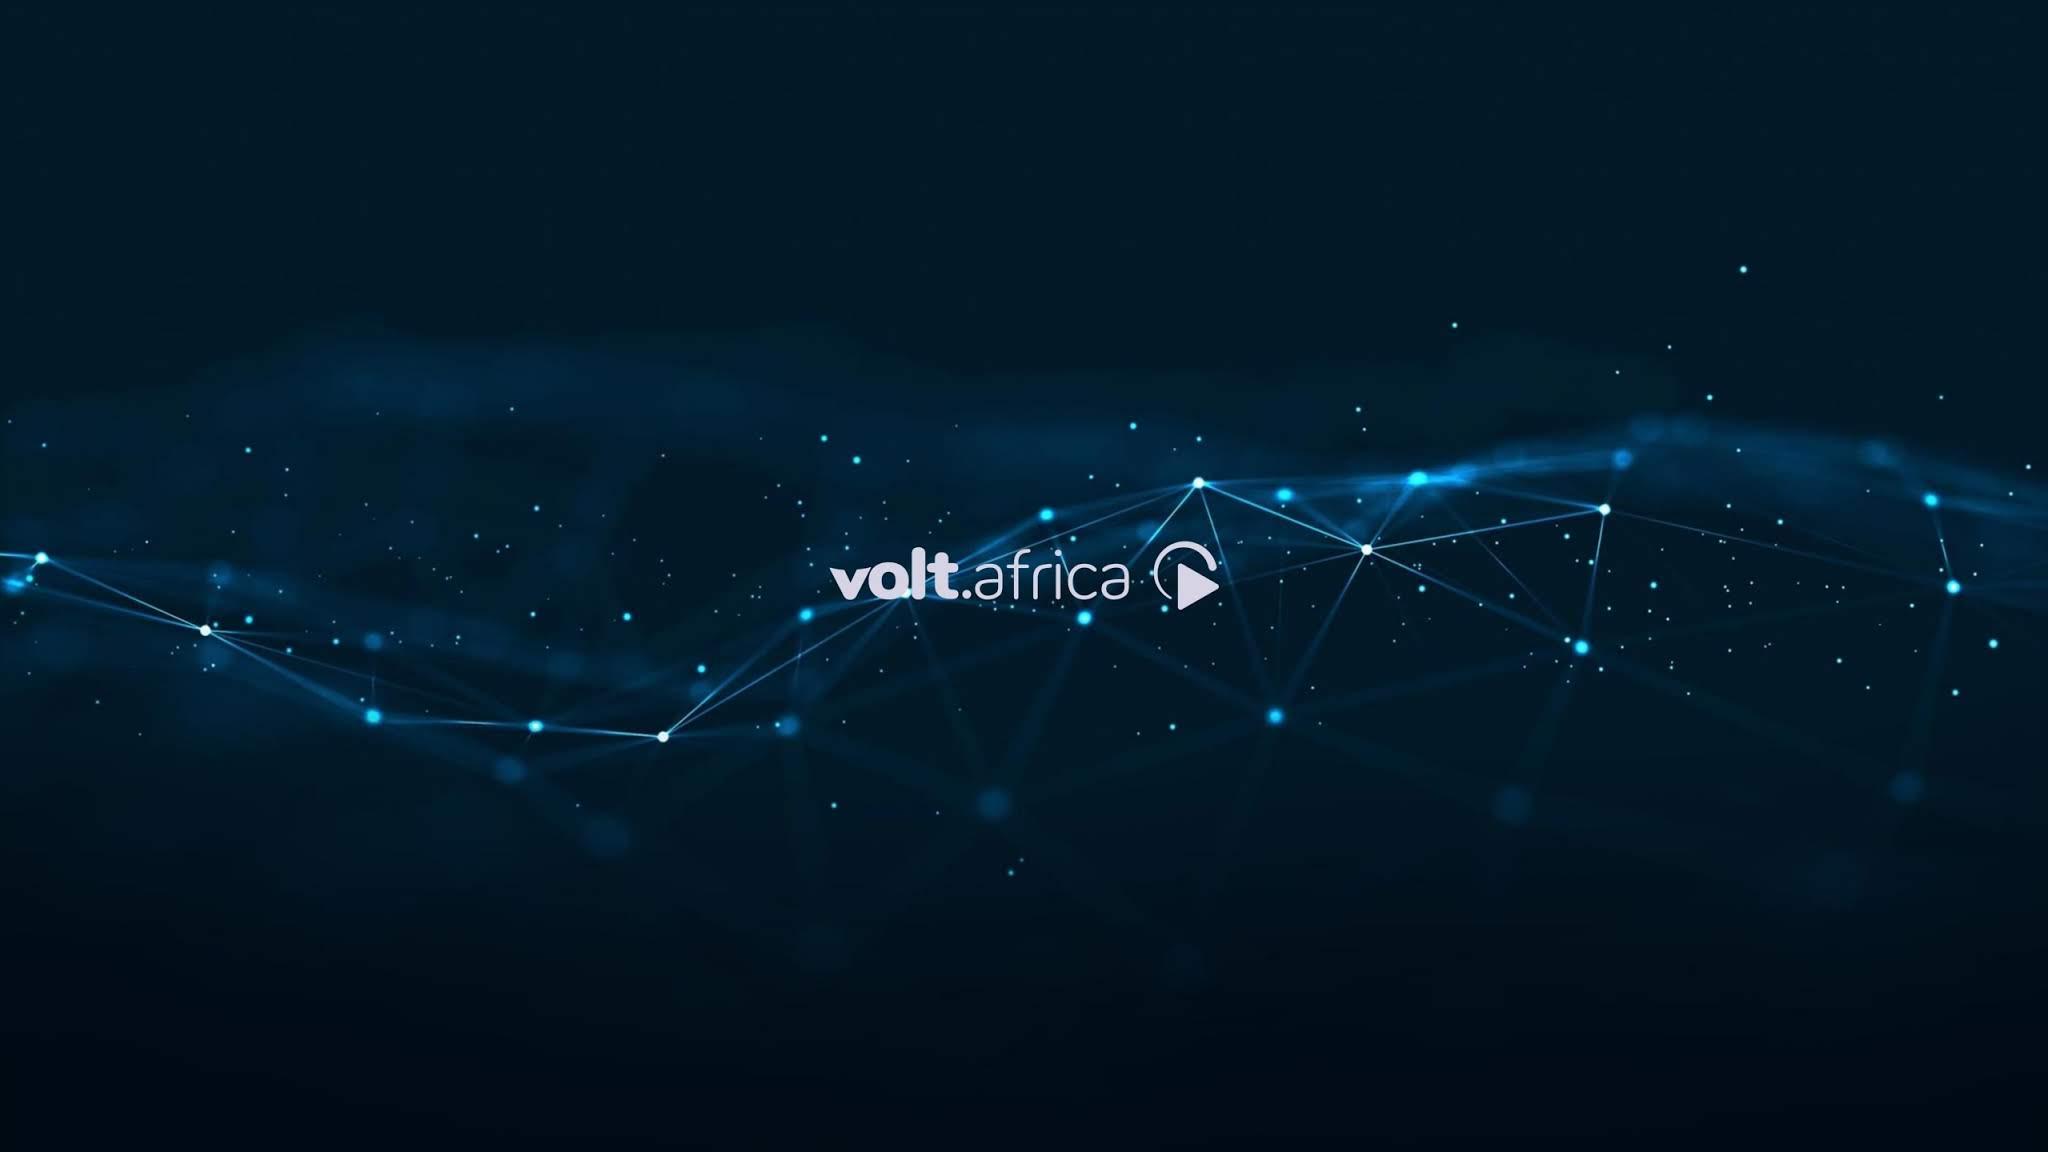 Volt Africa